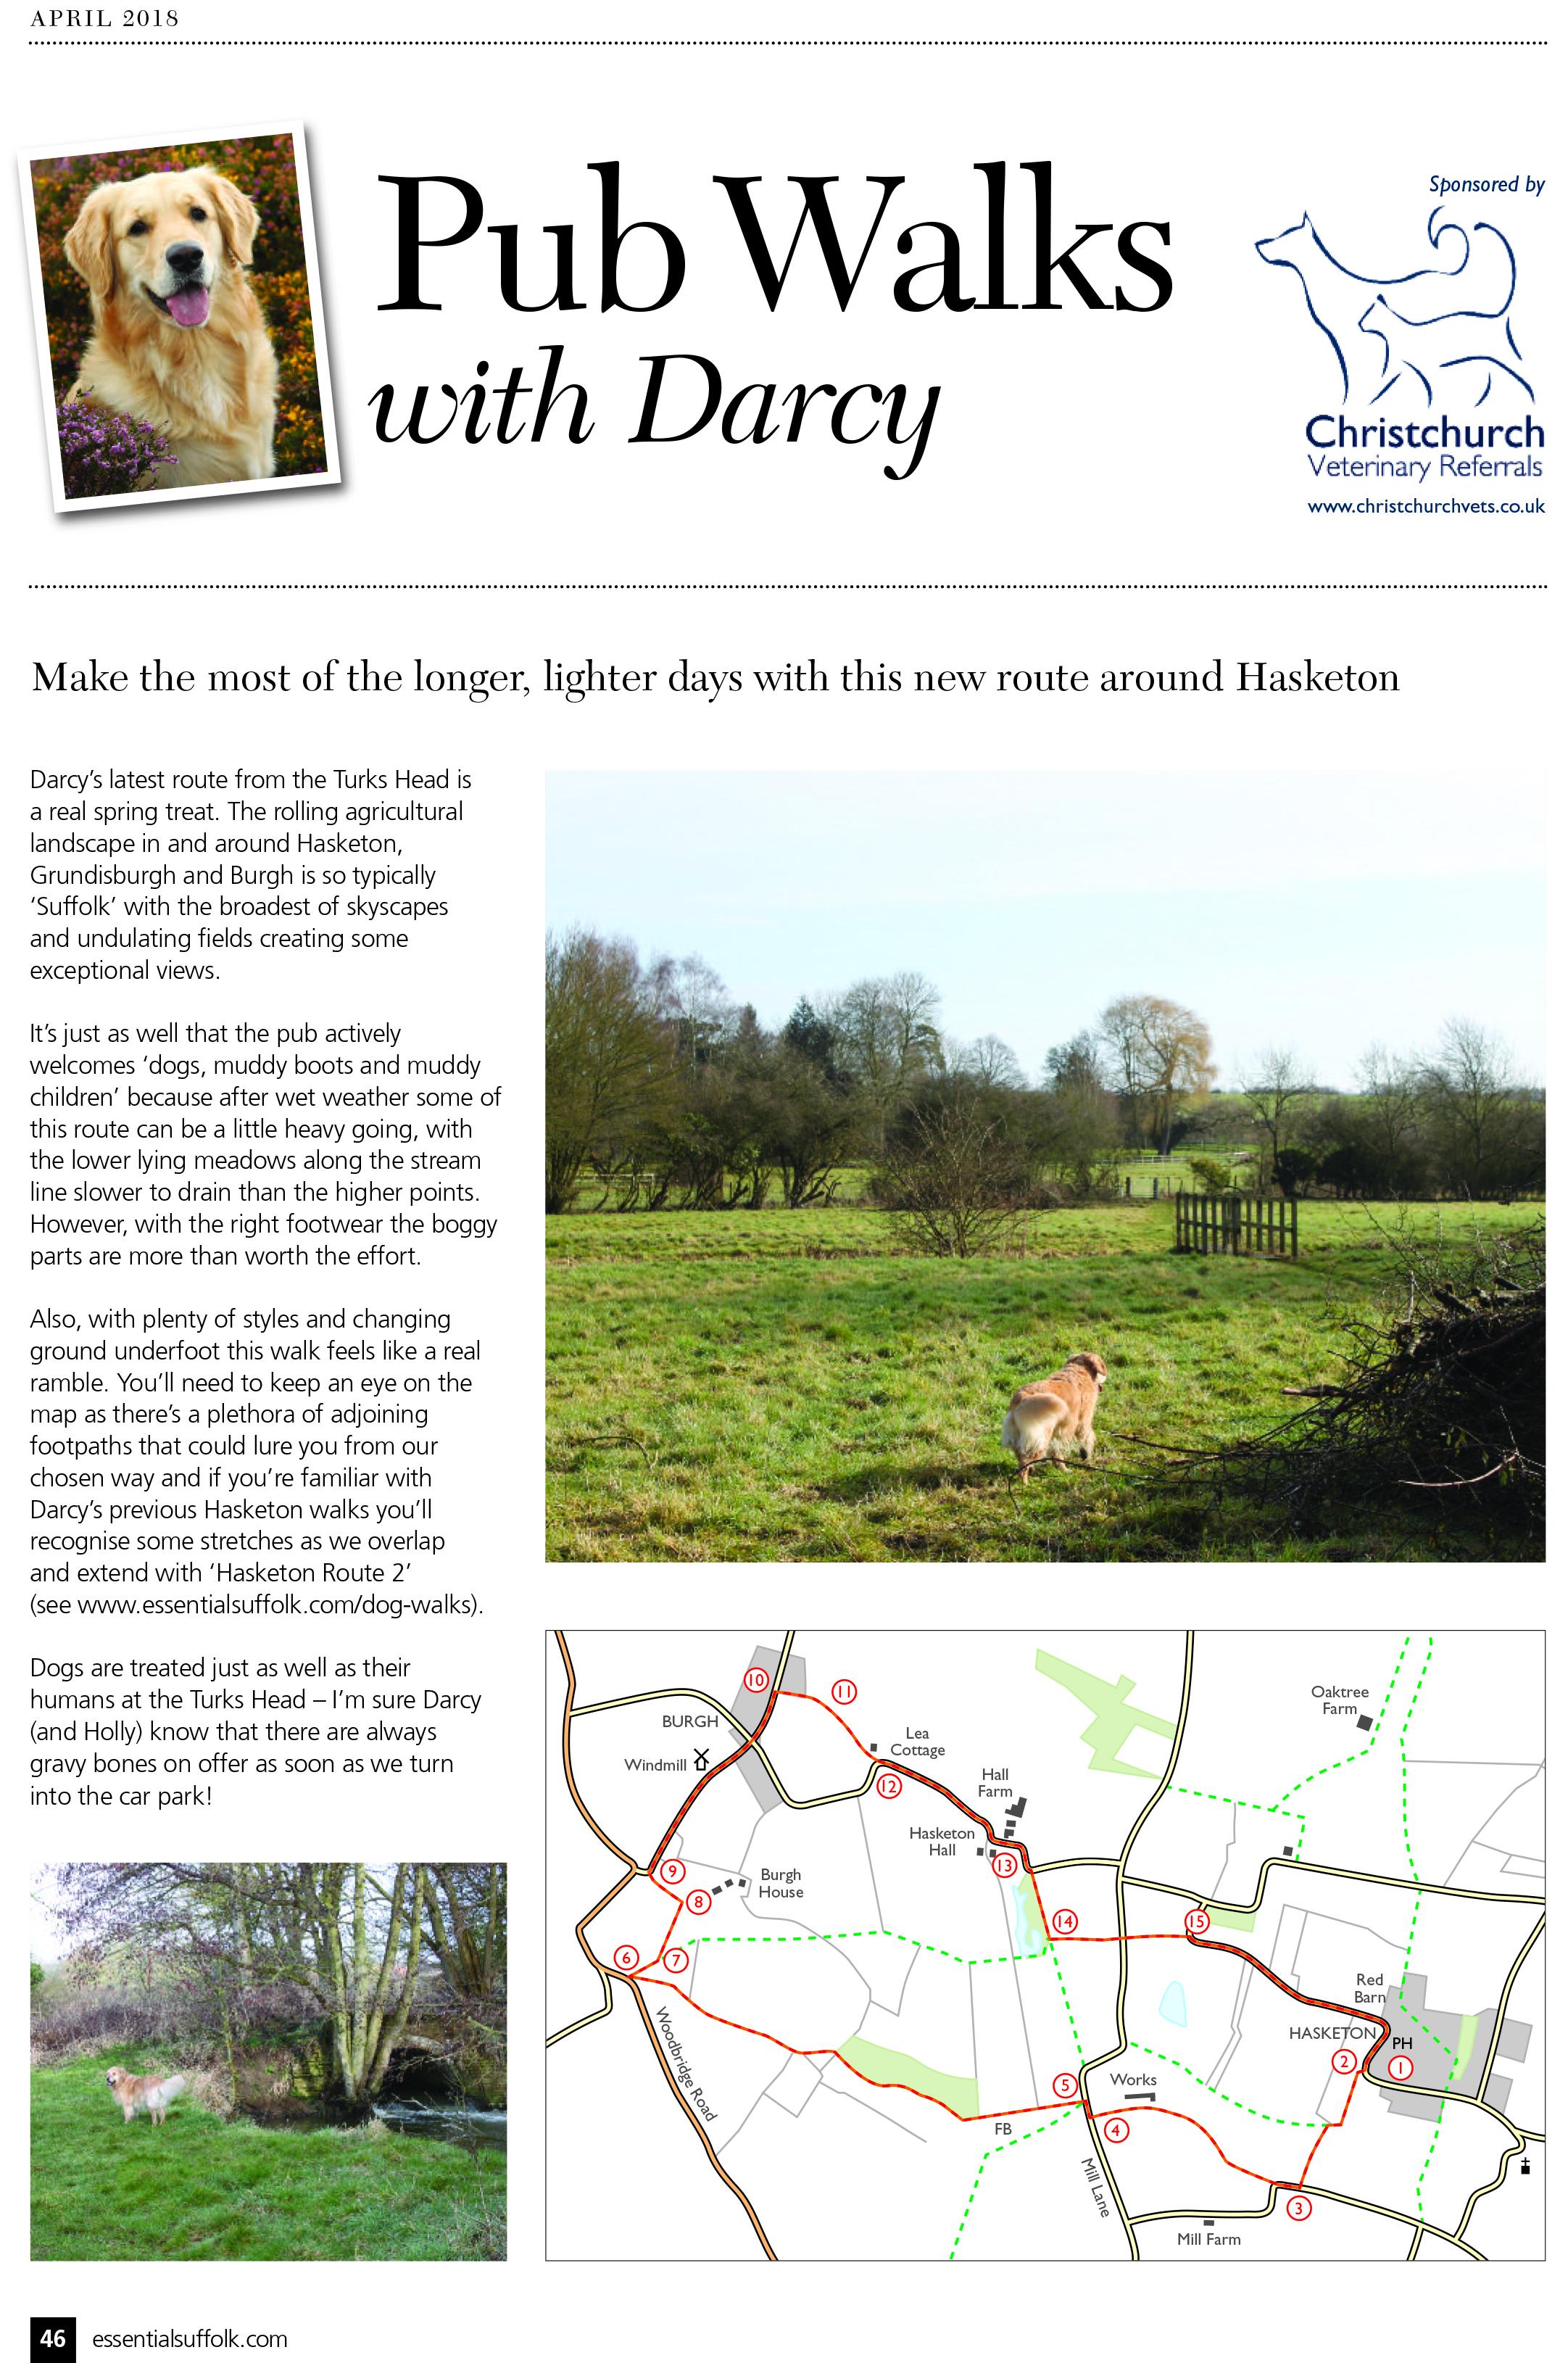 Hasketon Dog walk route 3 page 1.jpg